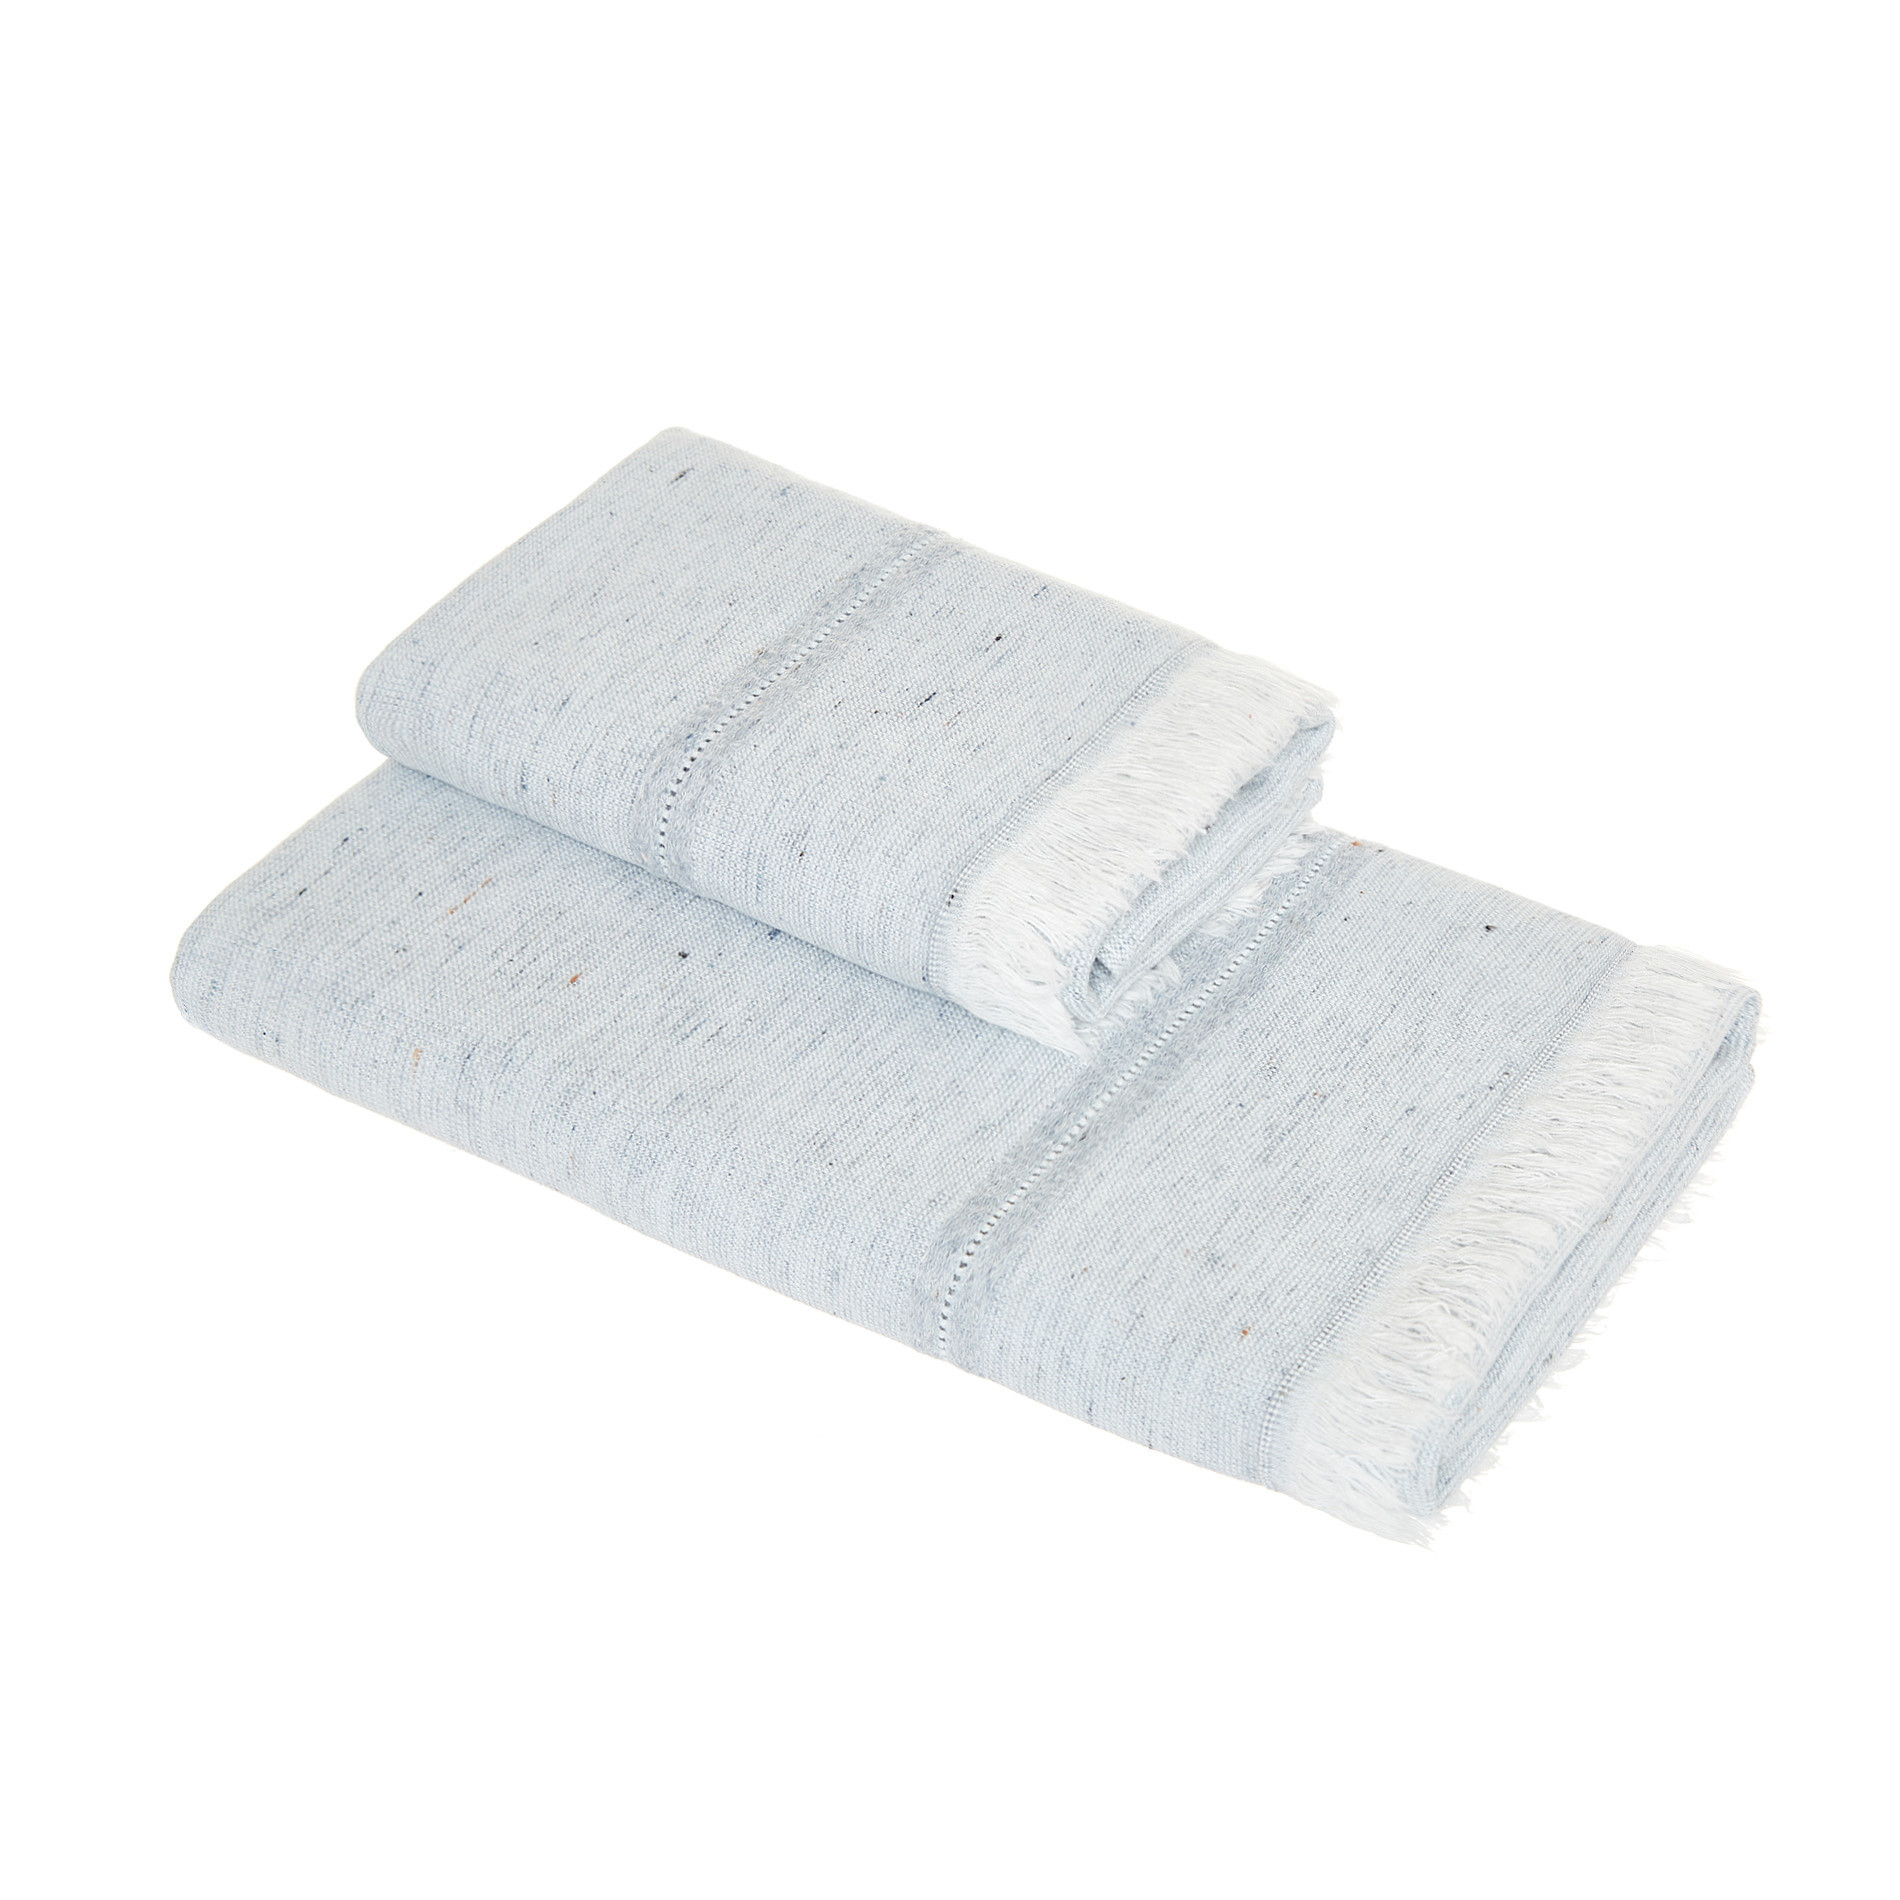 Asciugamano cotone e denim riciclato, Denim, large image number 0